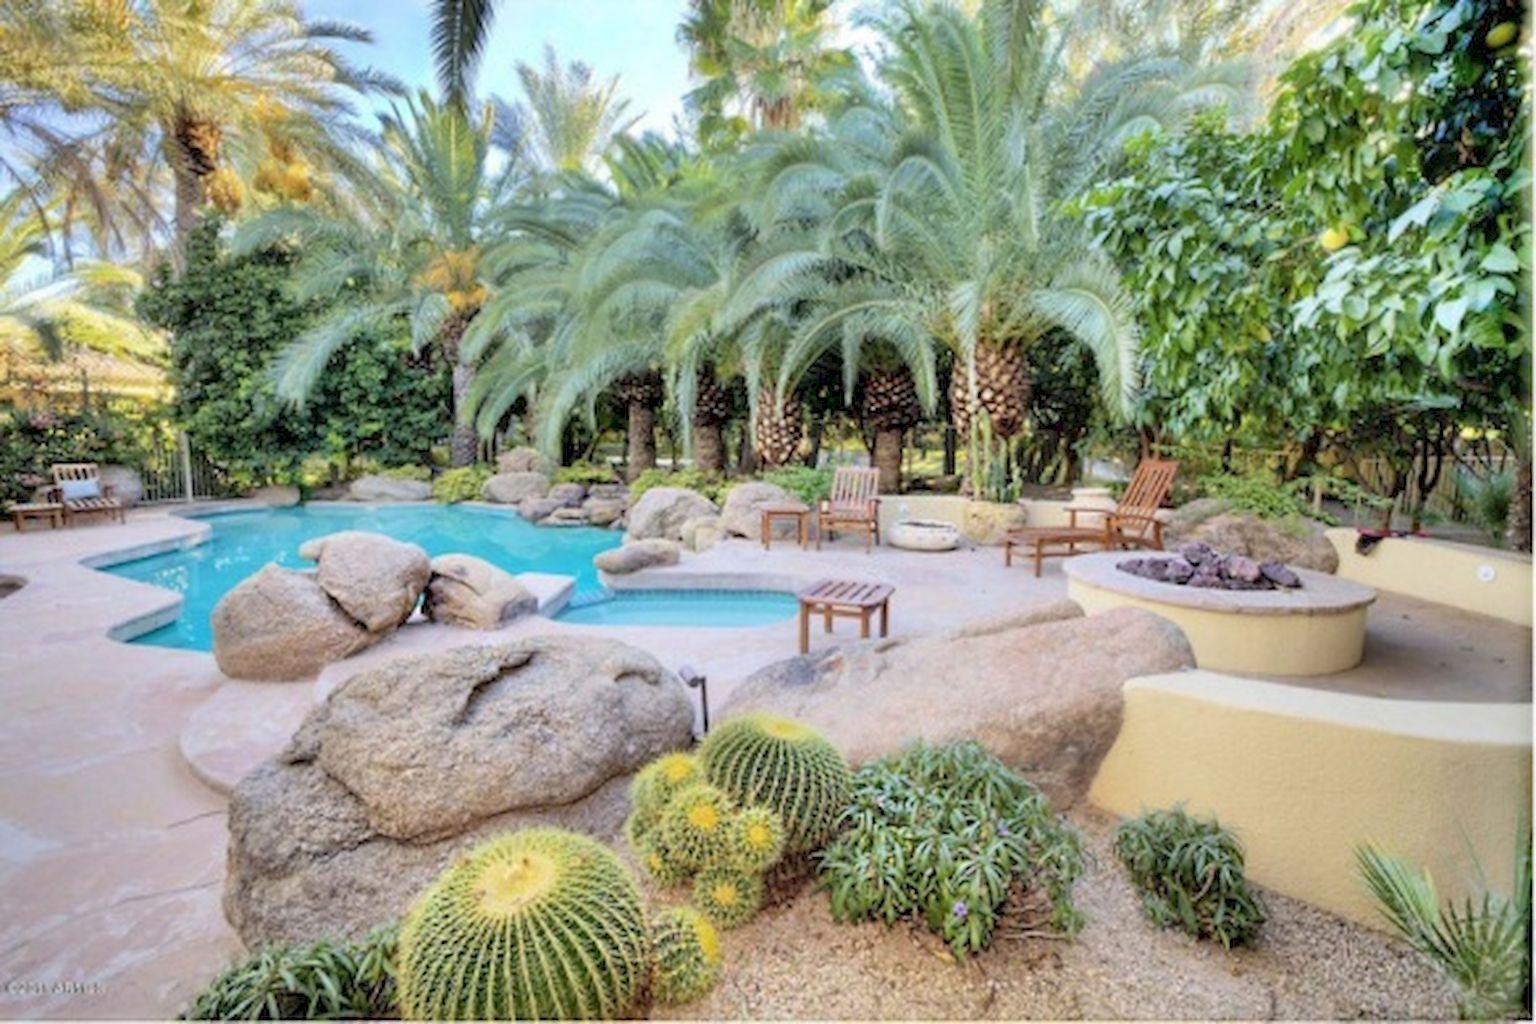 40 arizona backyard ideas on a budget (34 | Arizona ... on Backyard Desert Landscaping Ideas On A Budget id=12970